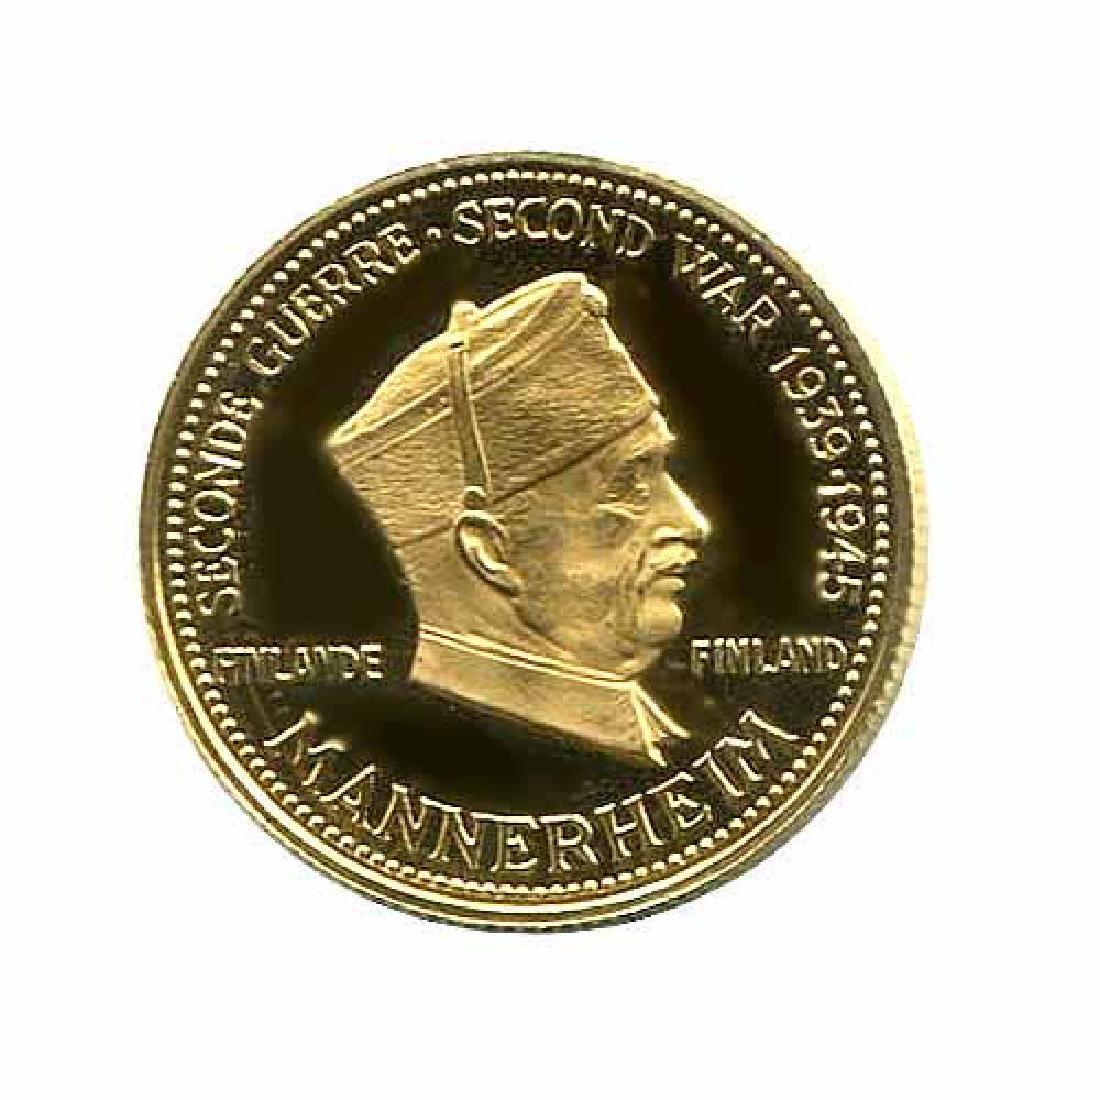 WWII Commemorative Proof Gold Medal 7g. 1958 Mannerheim